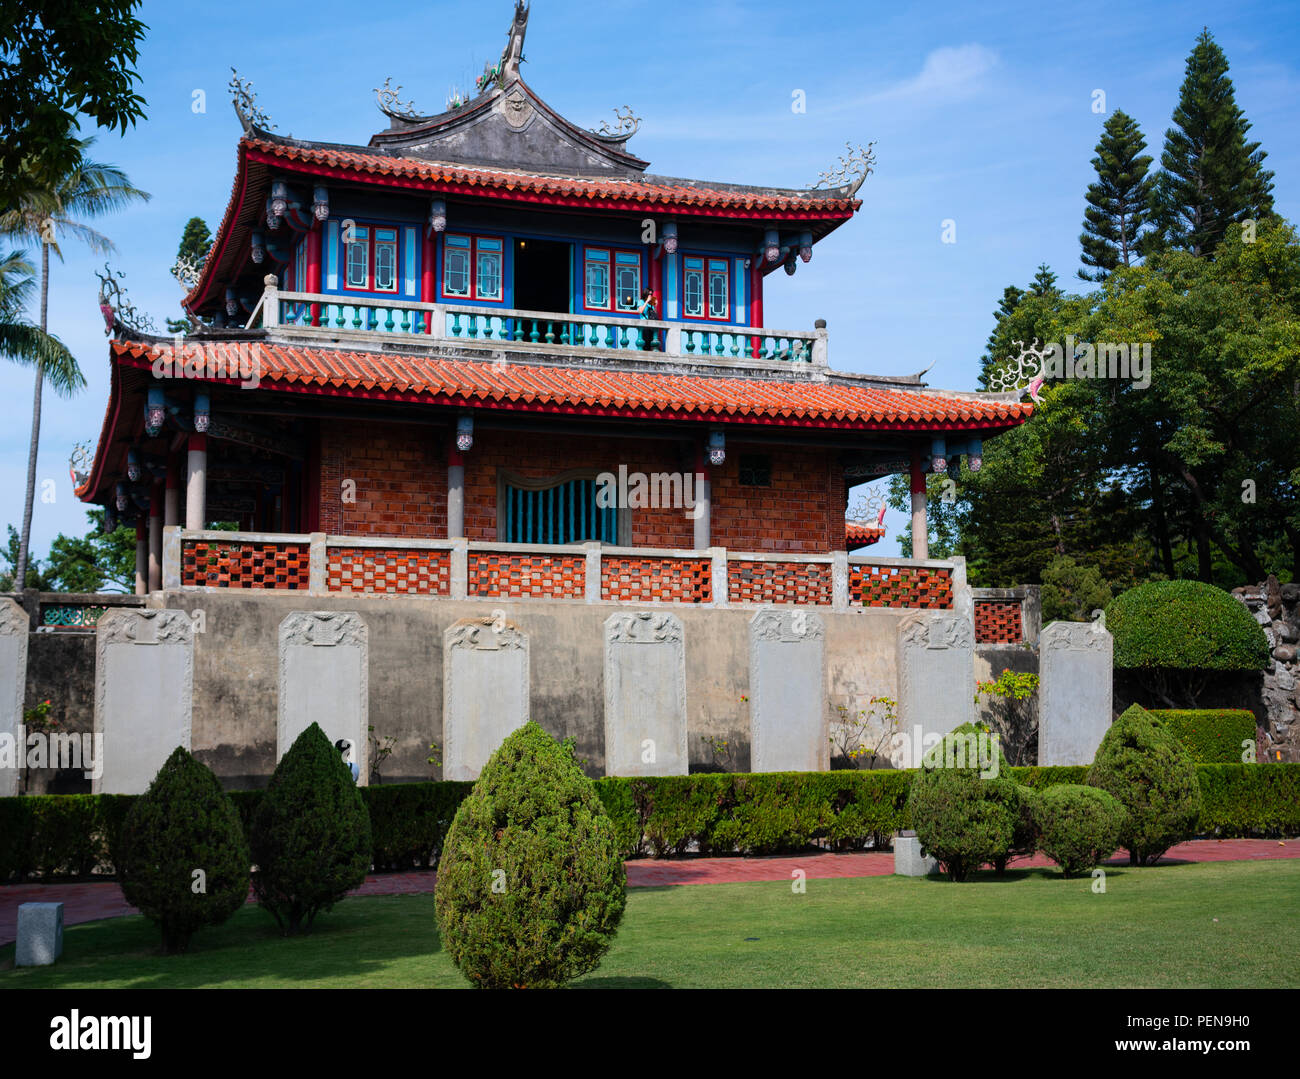 Vista de la vieja torre Chihkan Landmark at Fort provincia en Tainan Taiwán Imagen De Stock